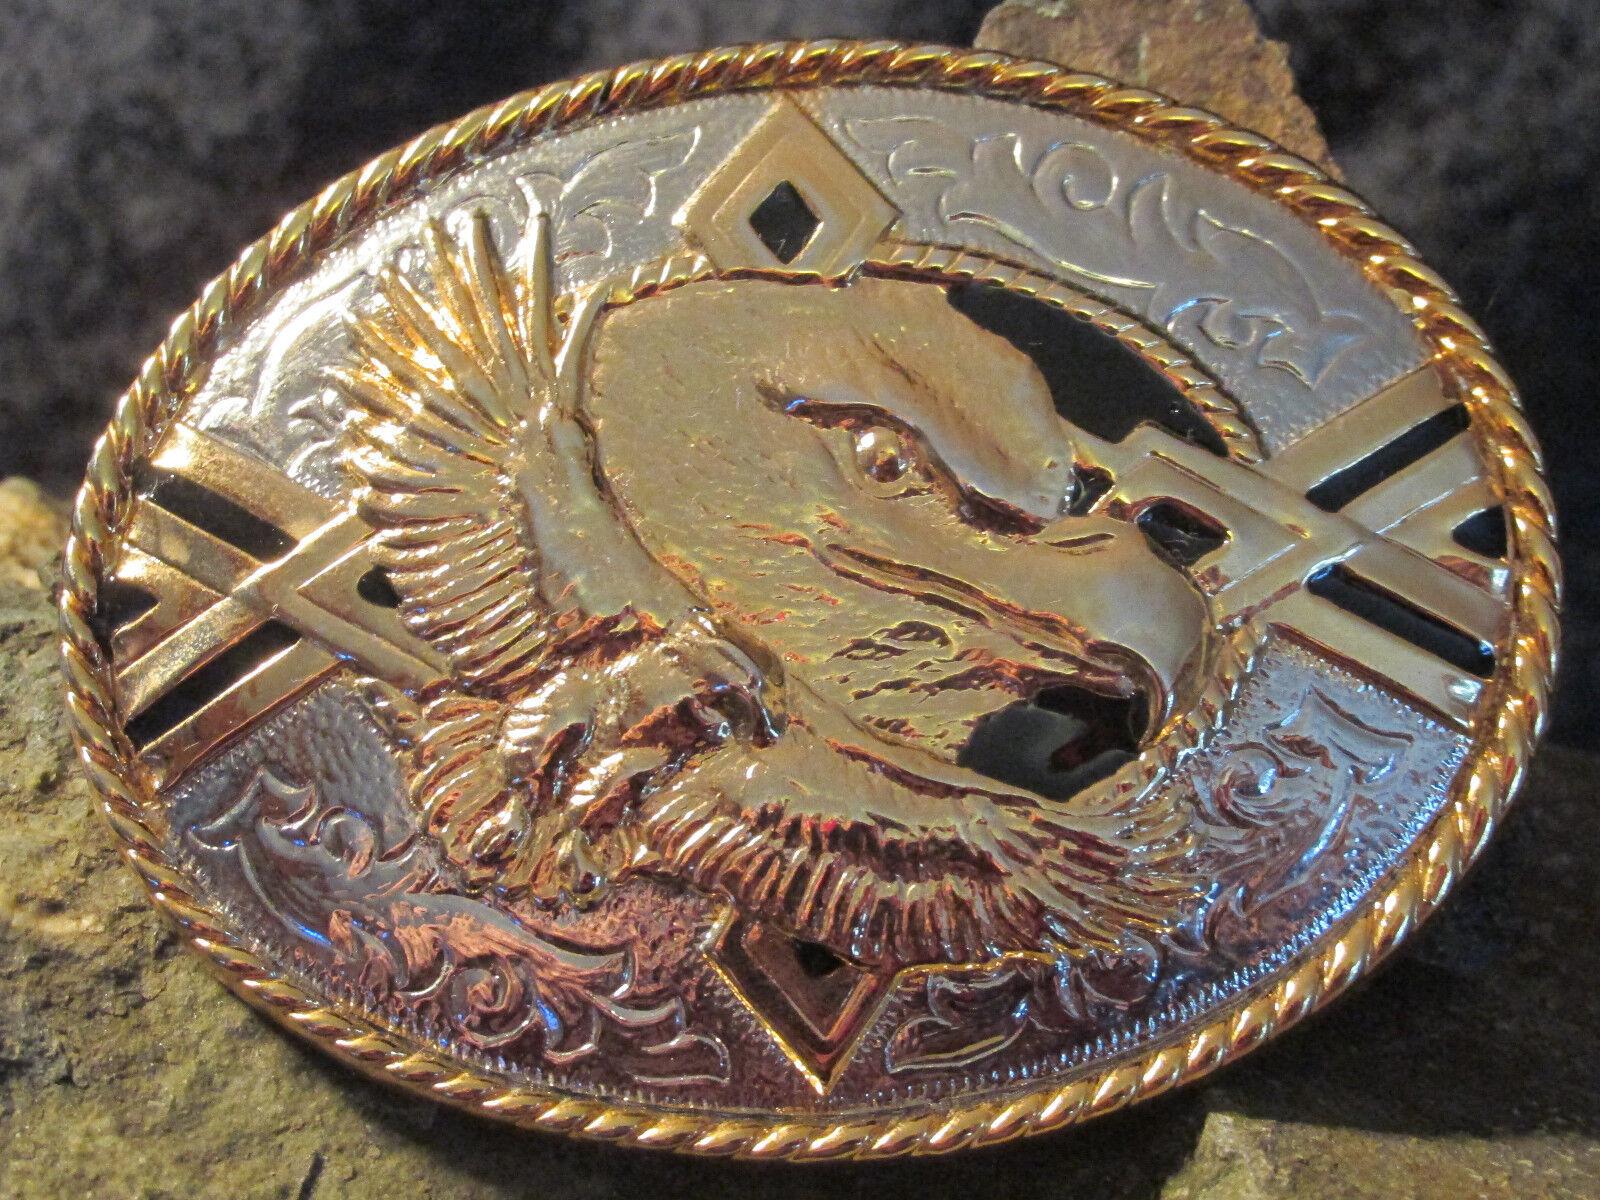 # 0290 Belt Buckle, Buckle, Gold Edge, Eagle Head, Flying Eagle